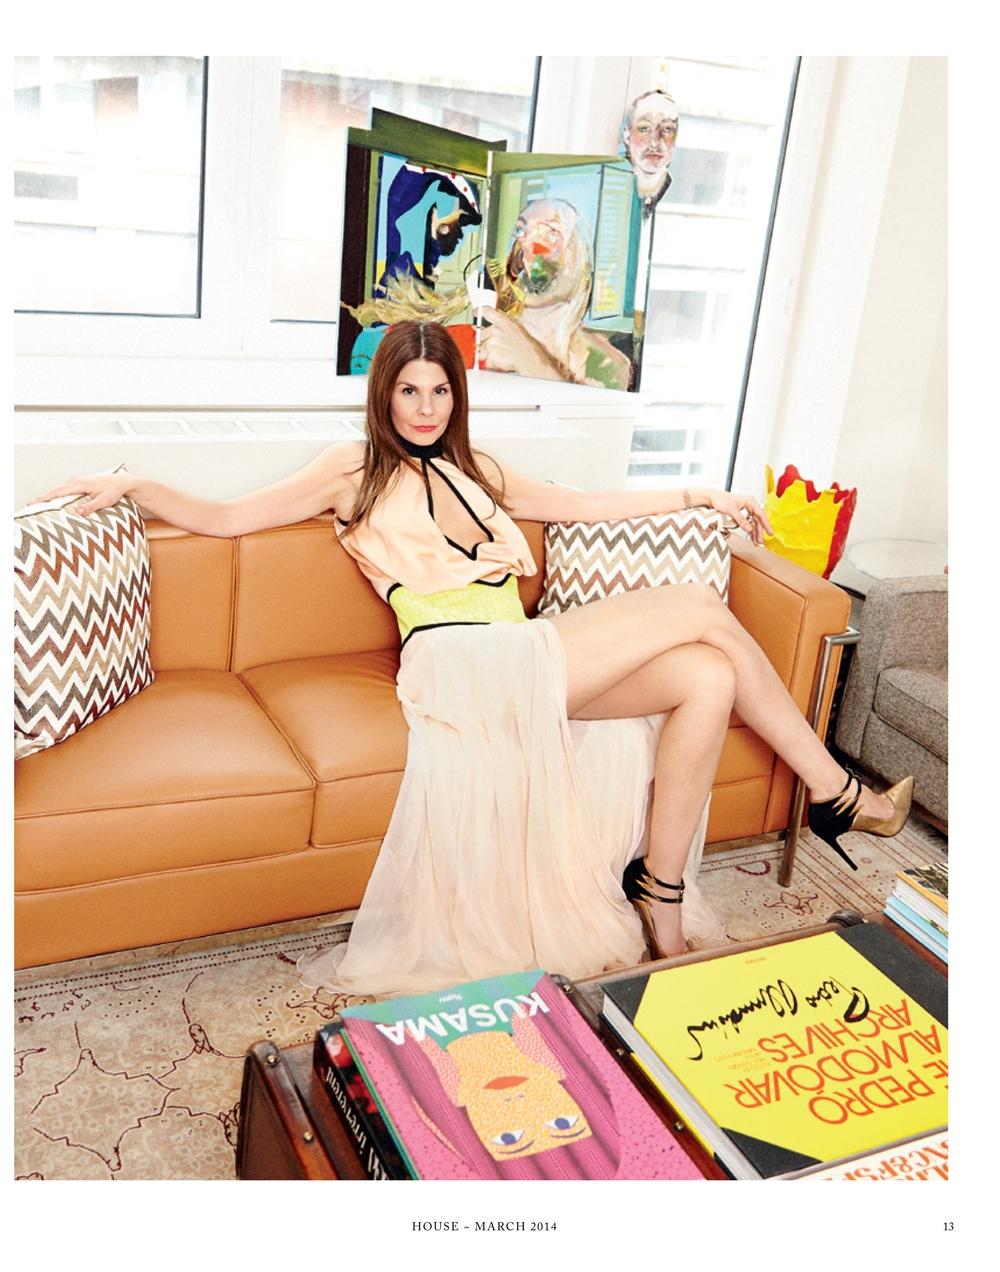 HouseMagazine-Maria Brito_002.jpg